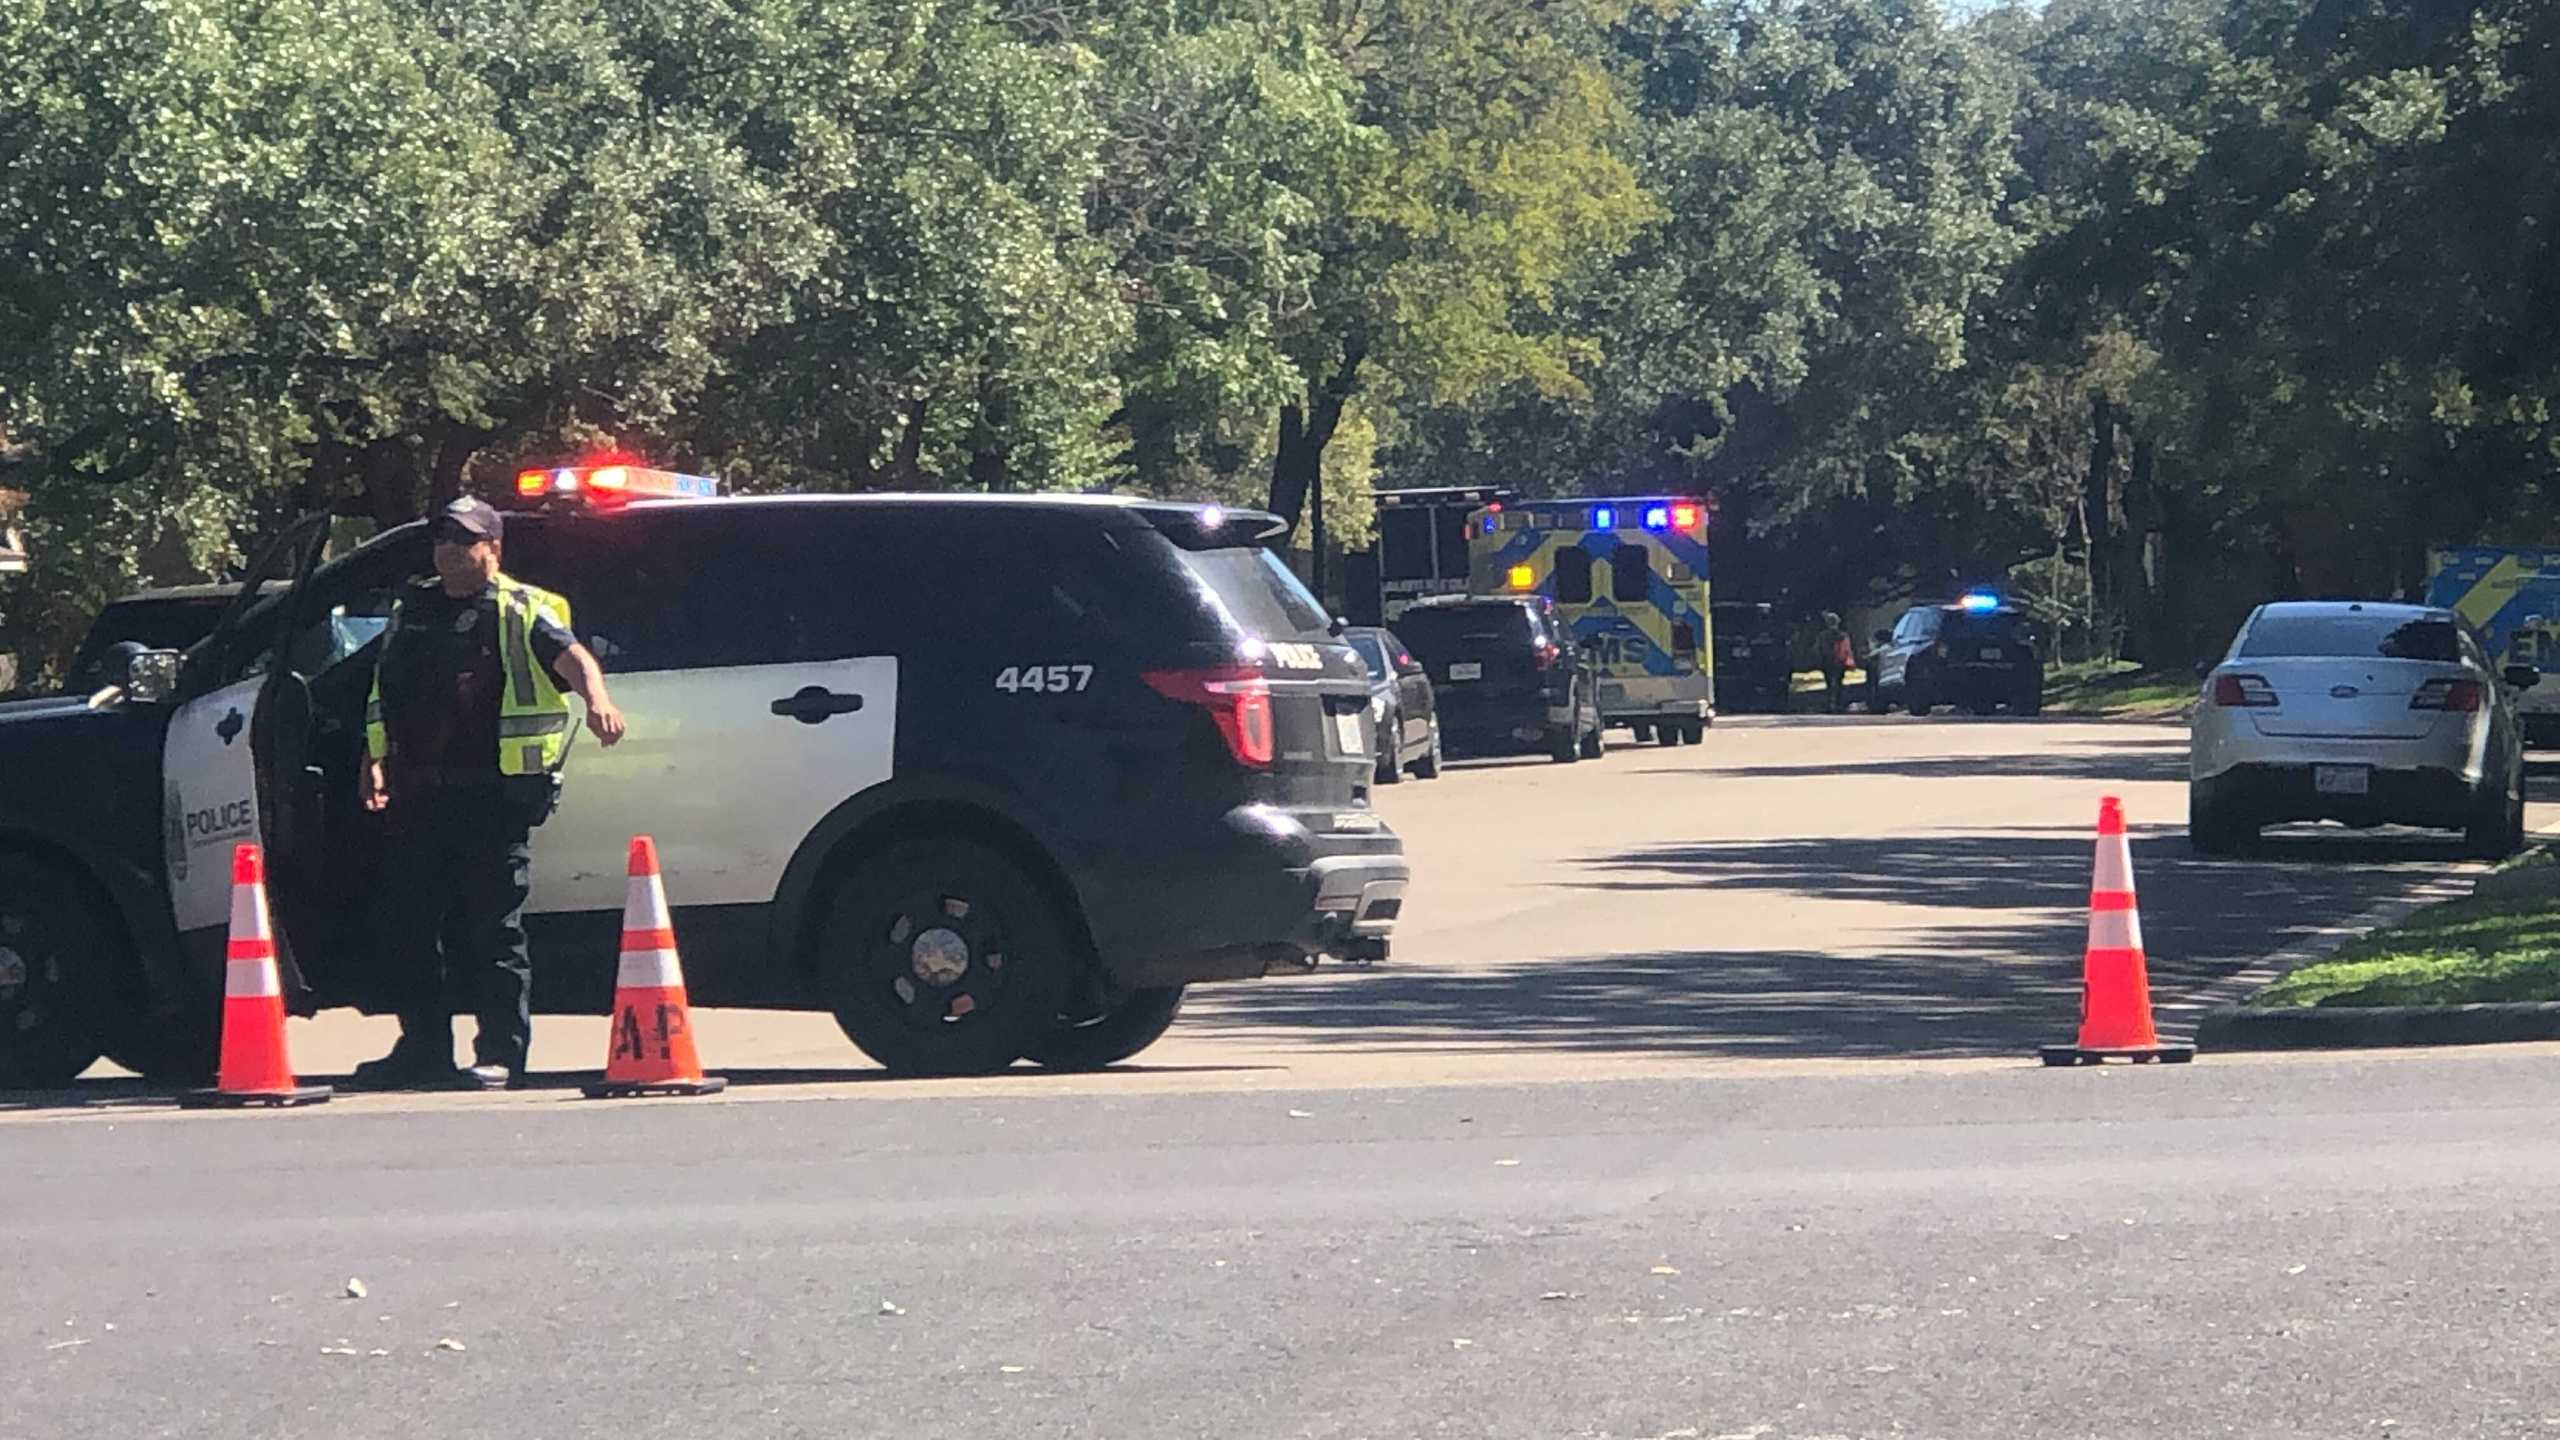 SWAT situation on Pinkney Lane in southwest Austin on Oct. 27, 2021 (KXAN Photo/Frank Martinez)